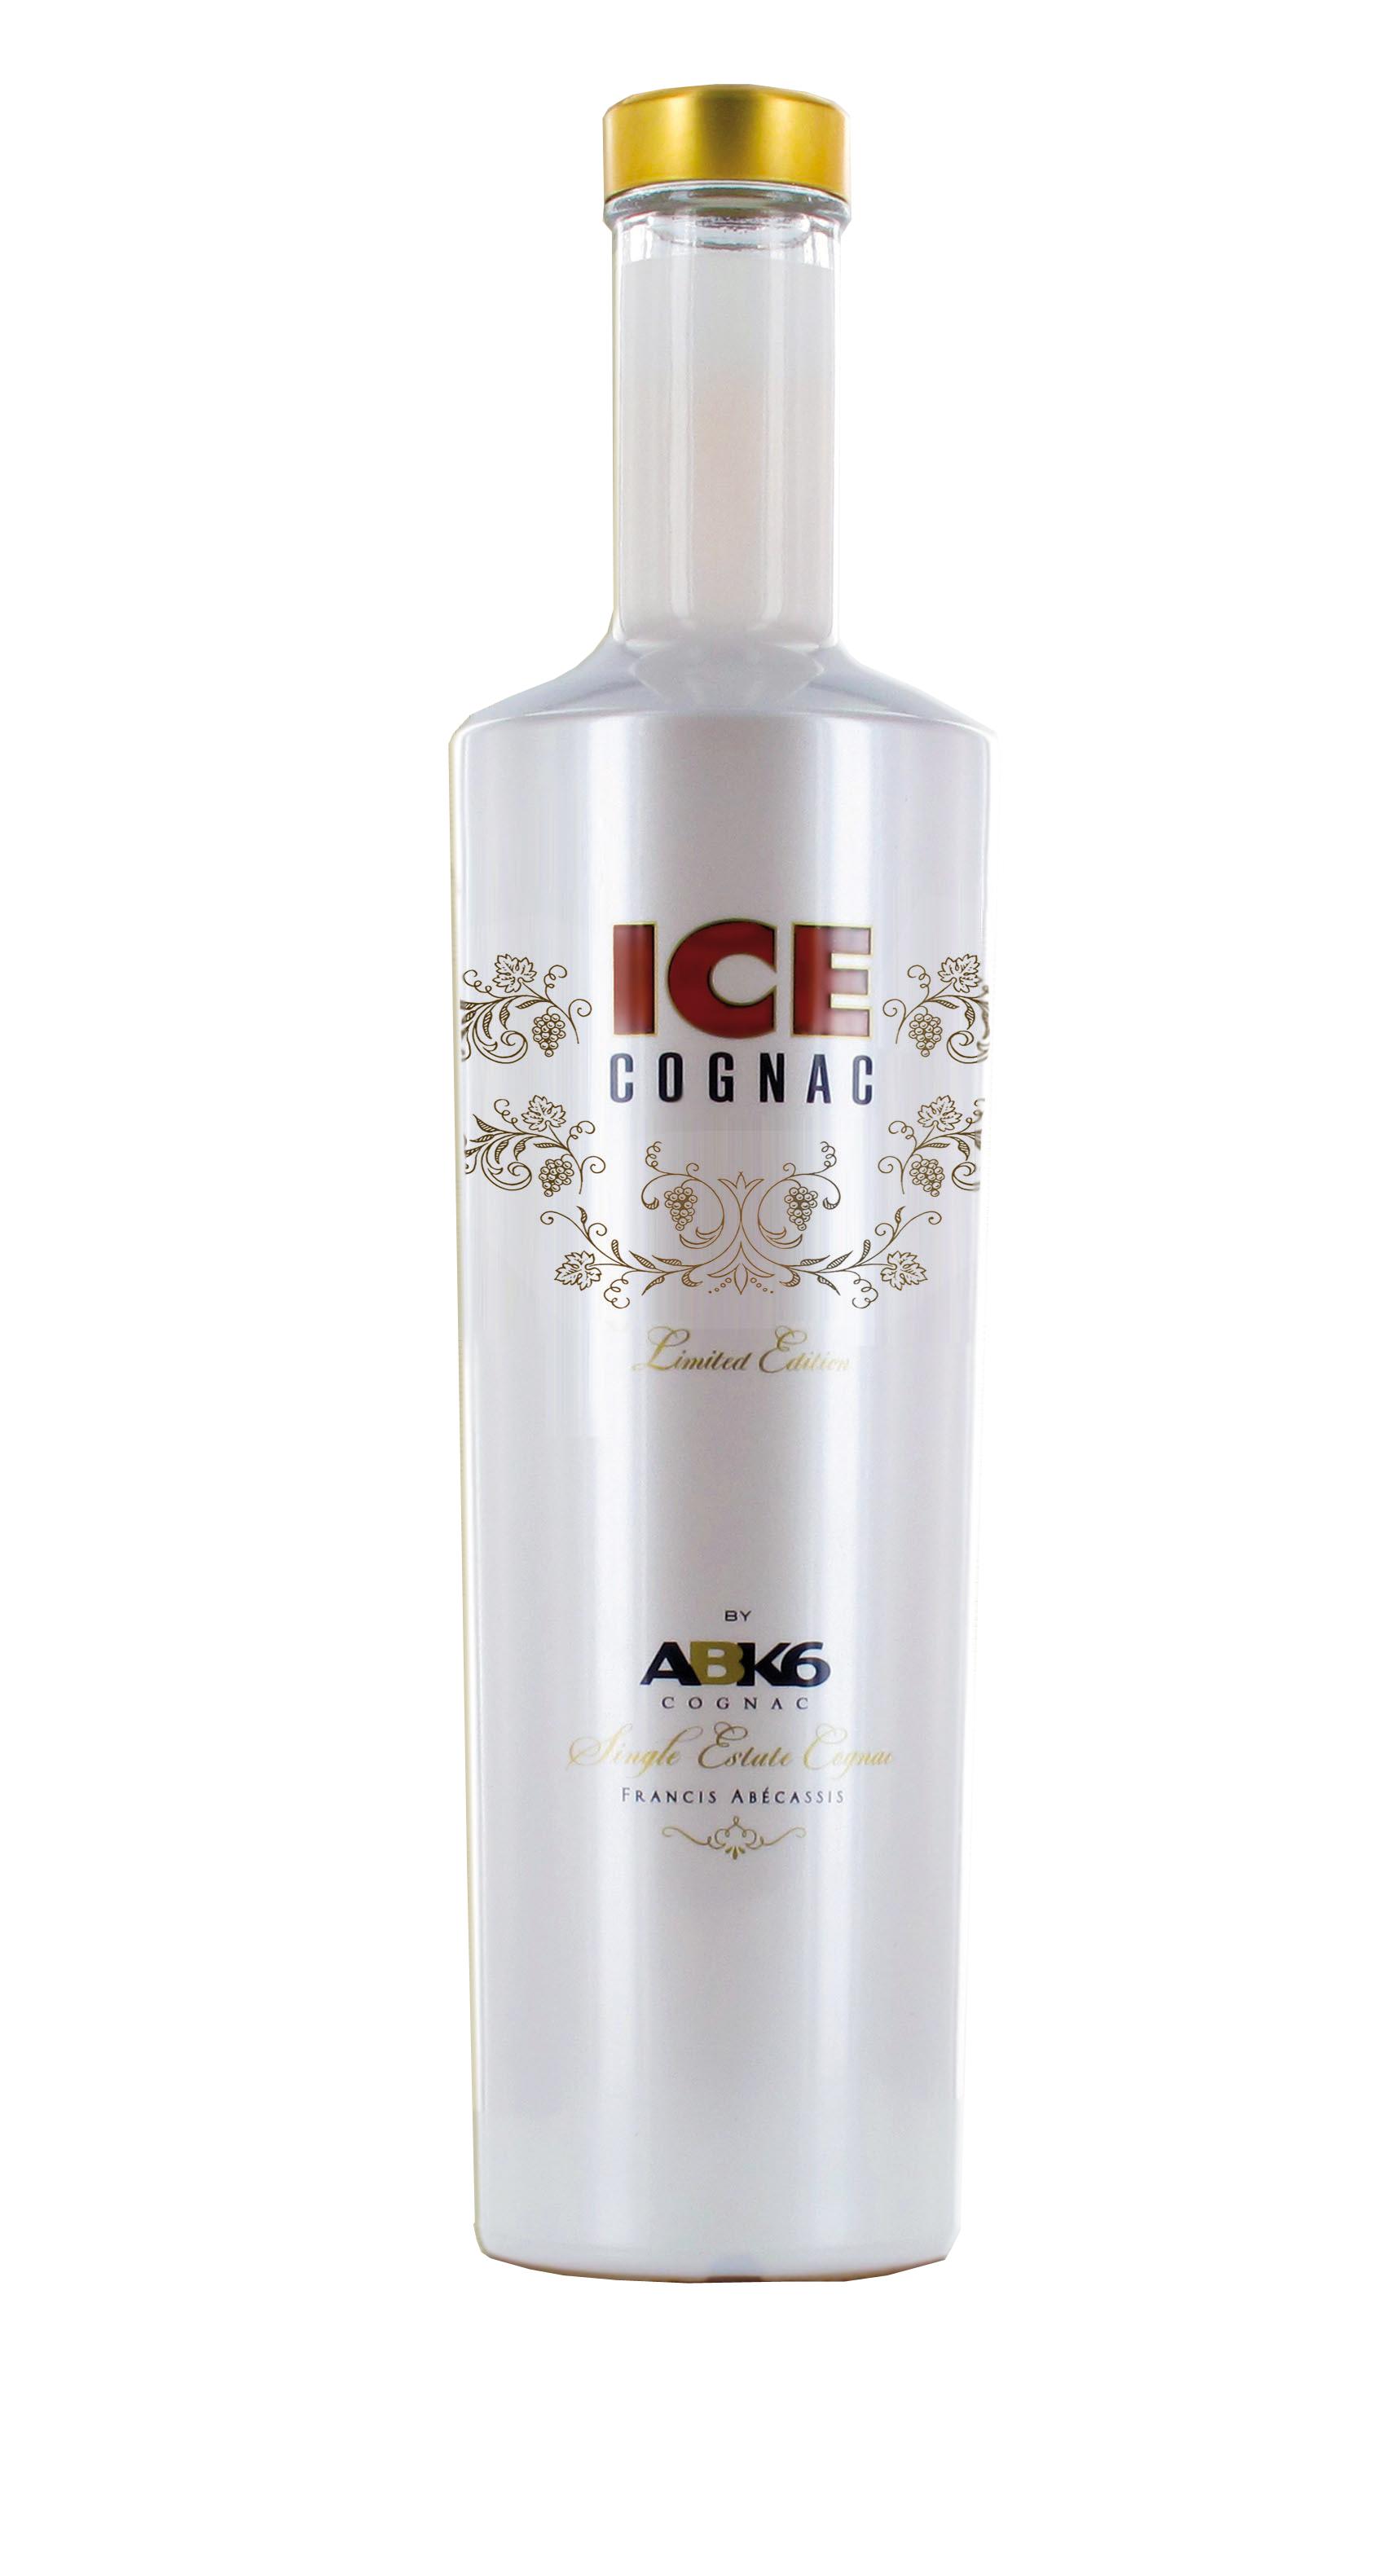 ABK6-ICE